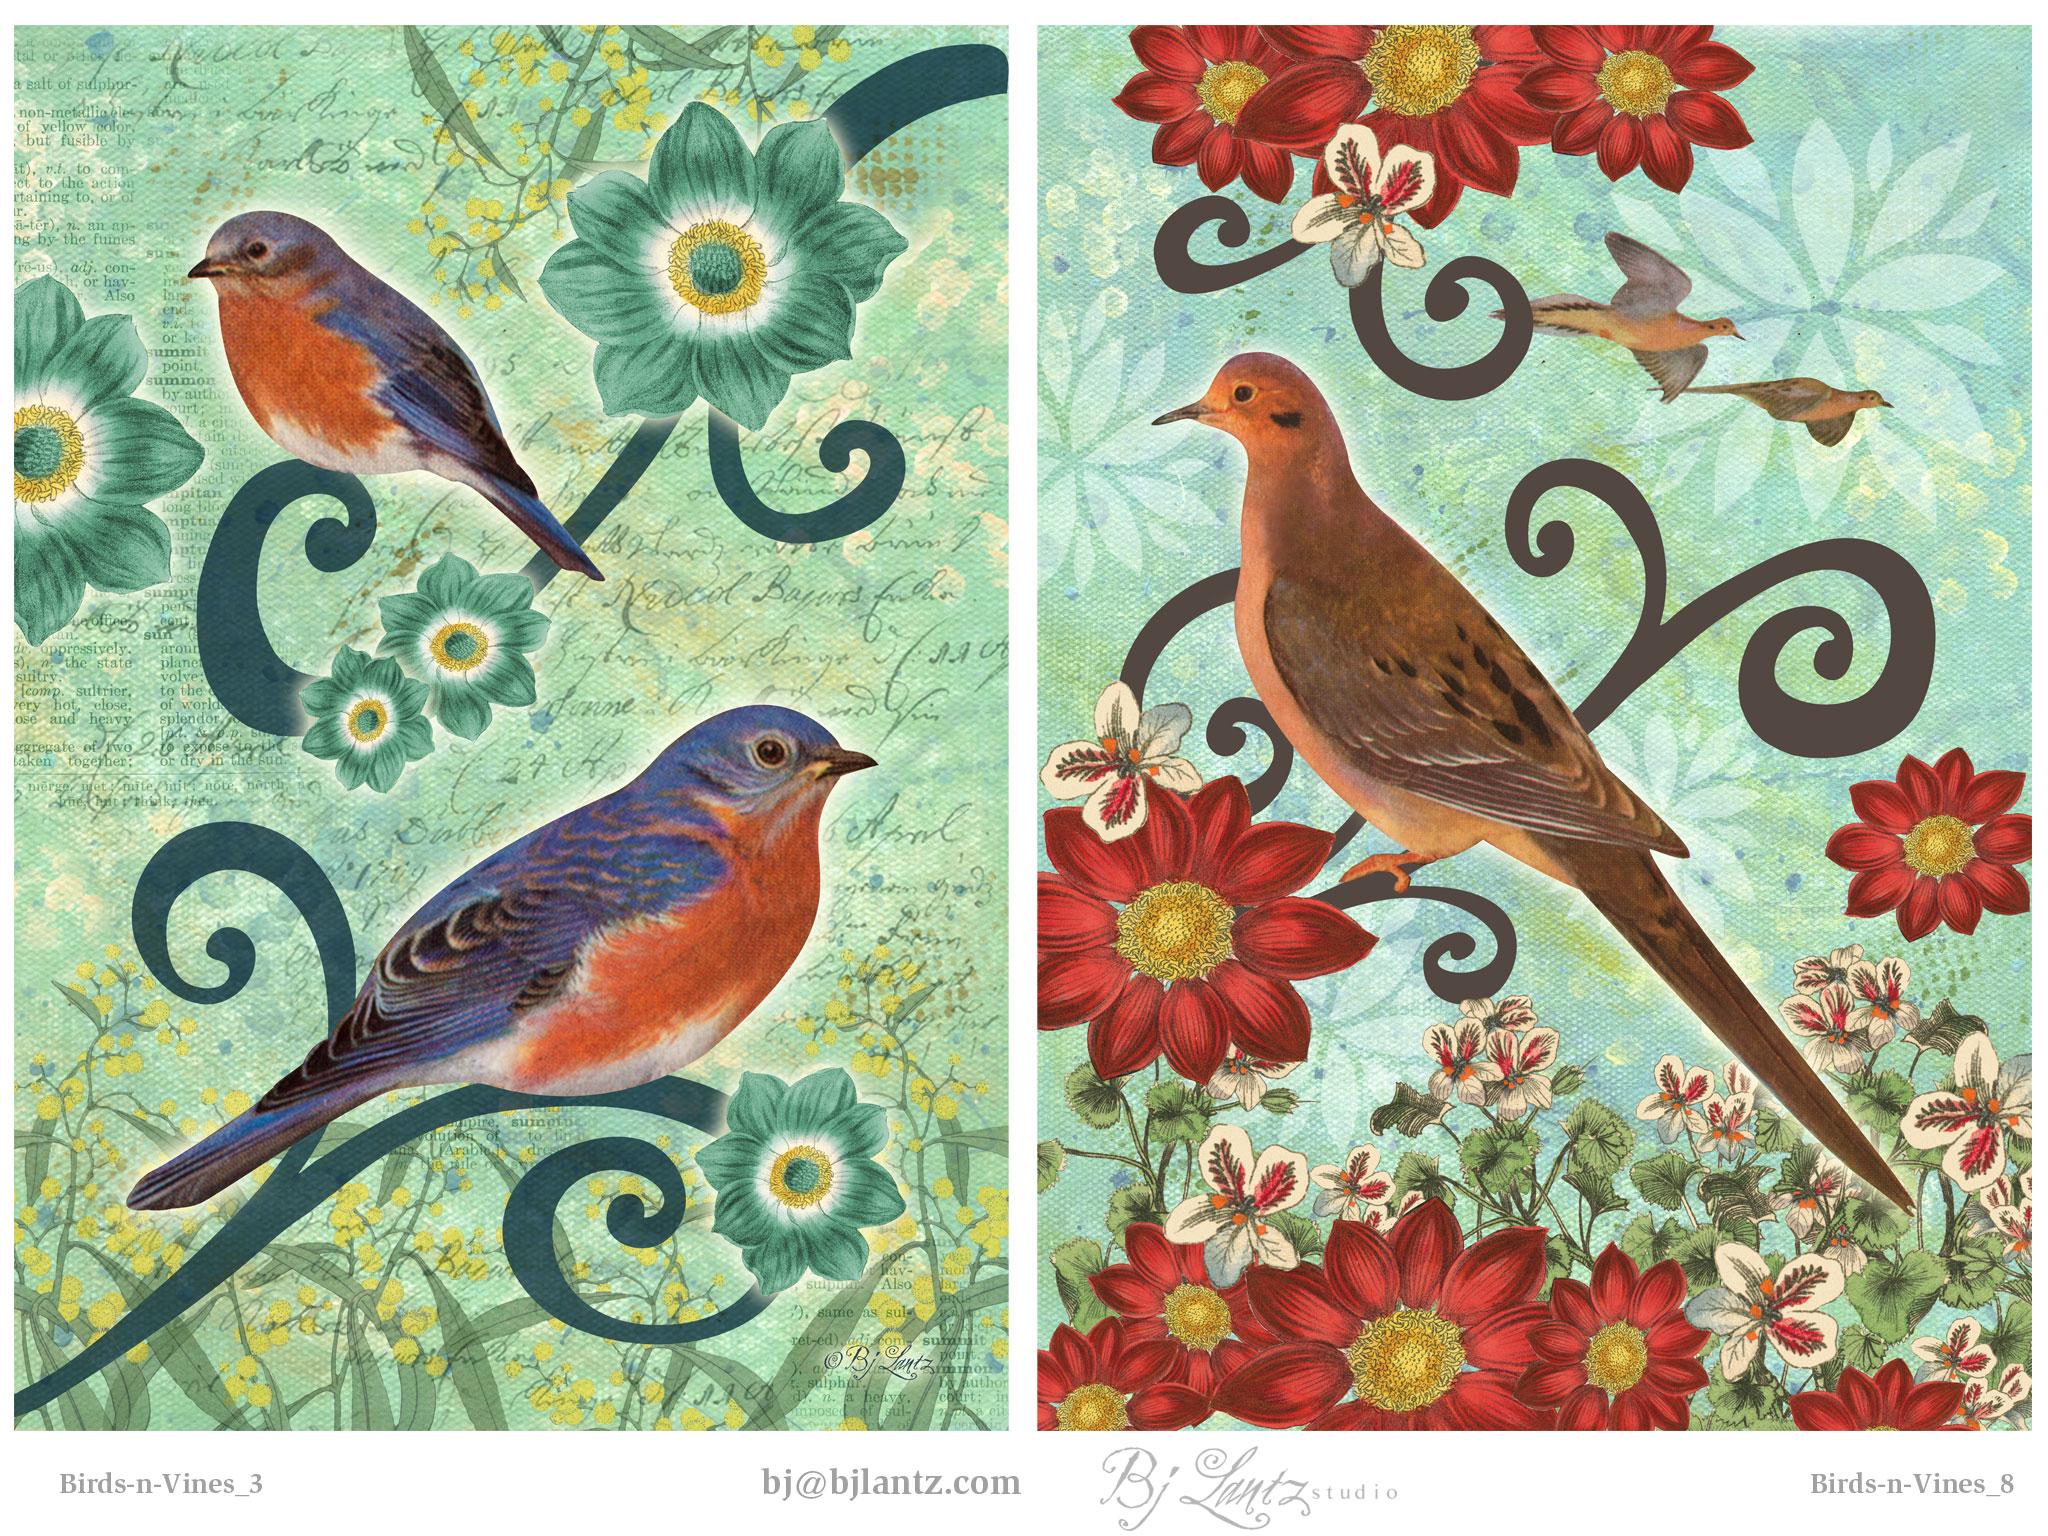 Birds-n-Vines_BJLantz_4.jpg